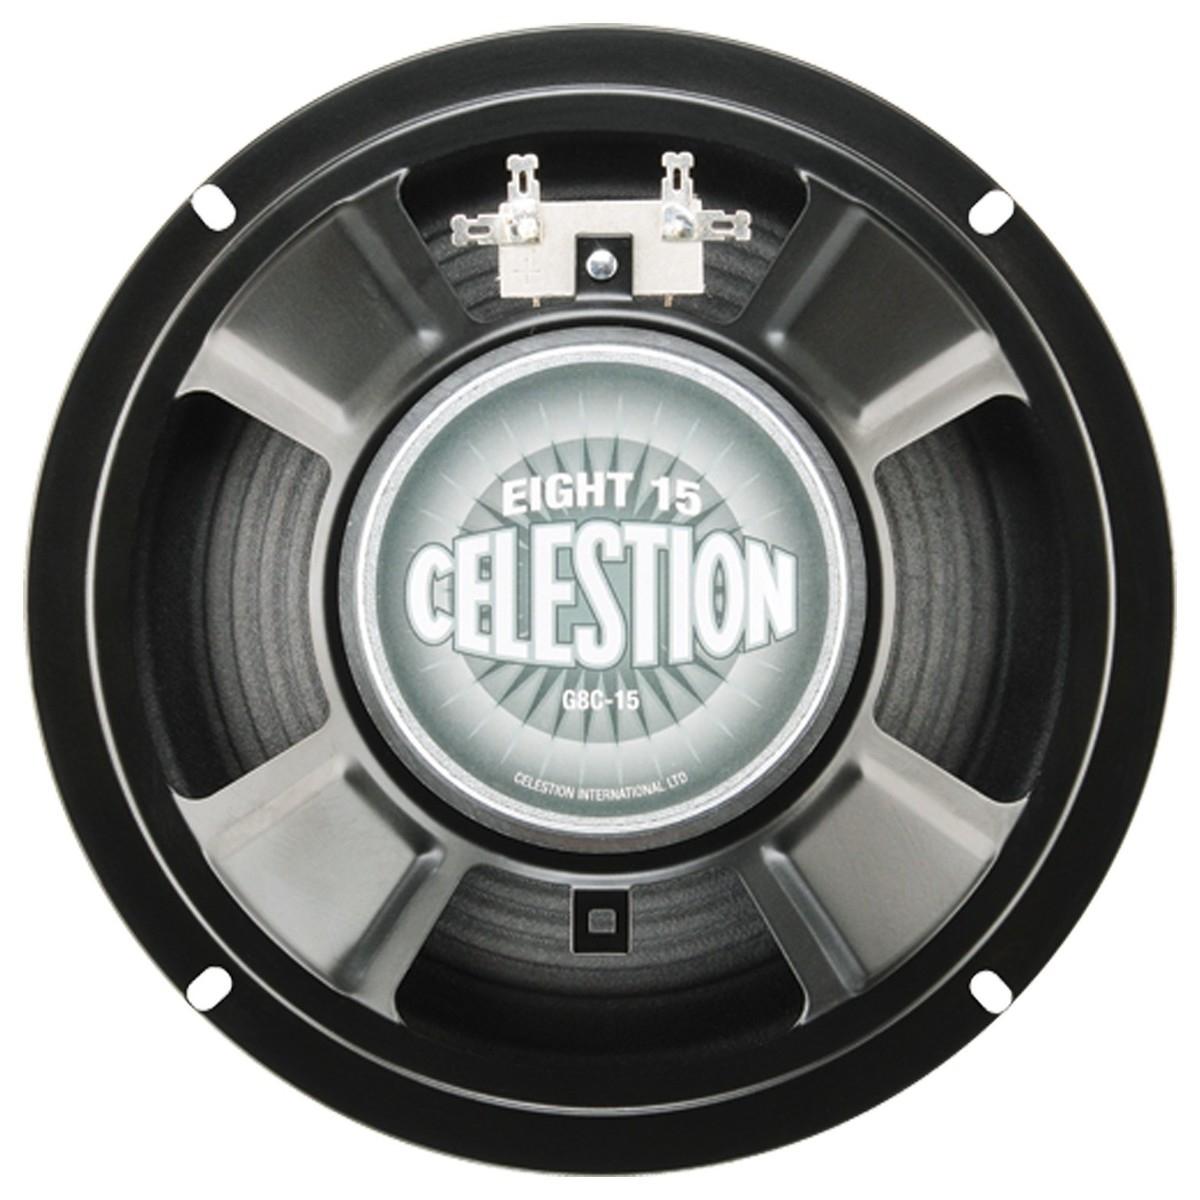 CELESTION Eight 15 4Ohm